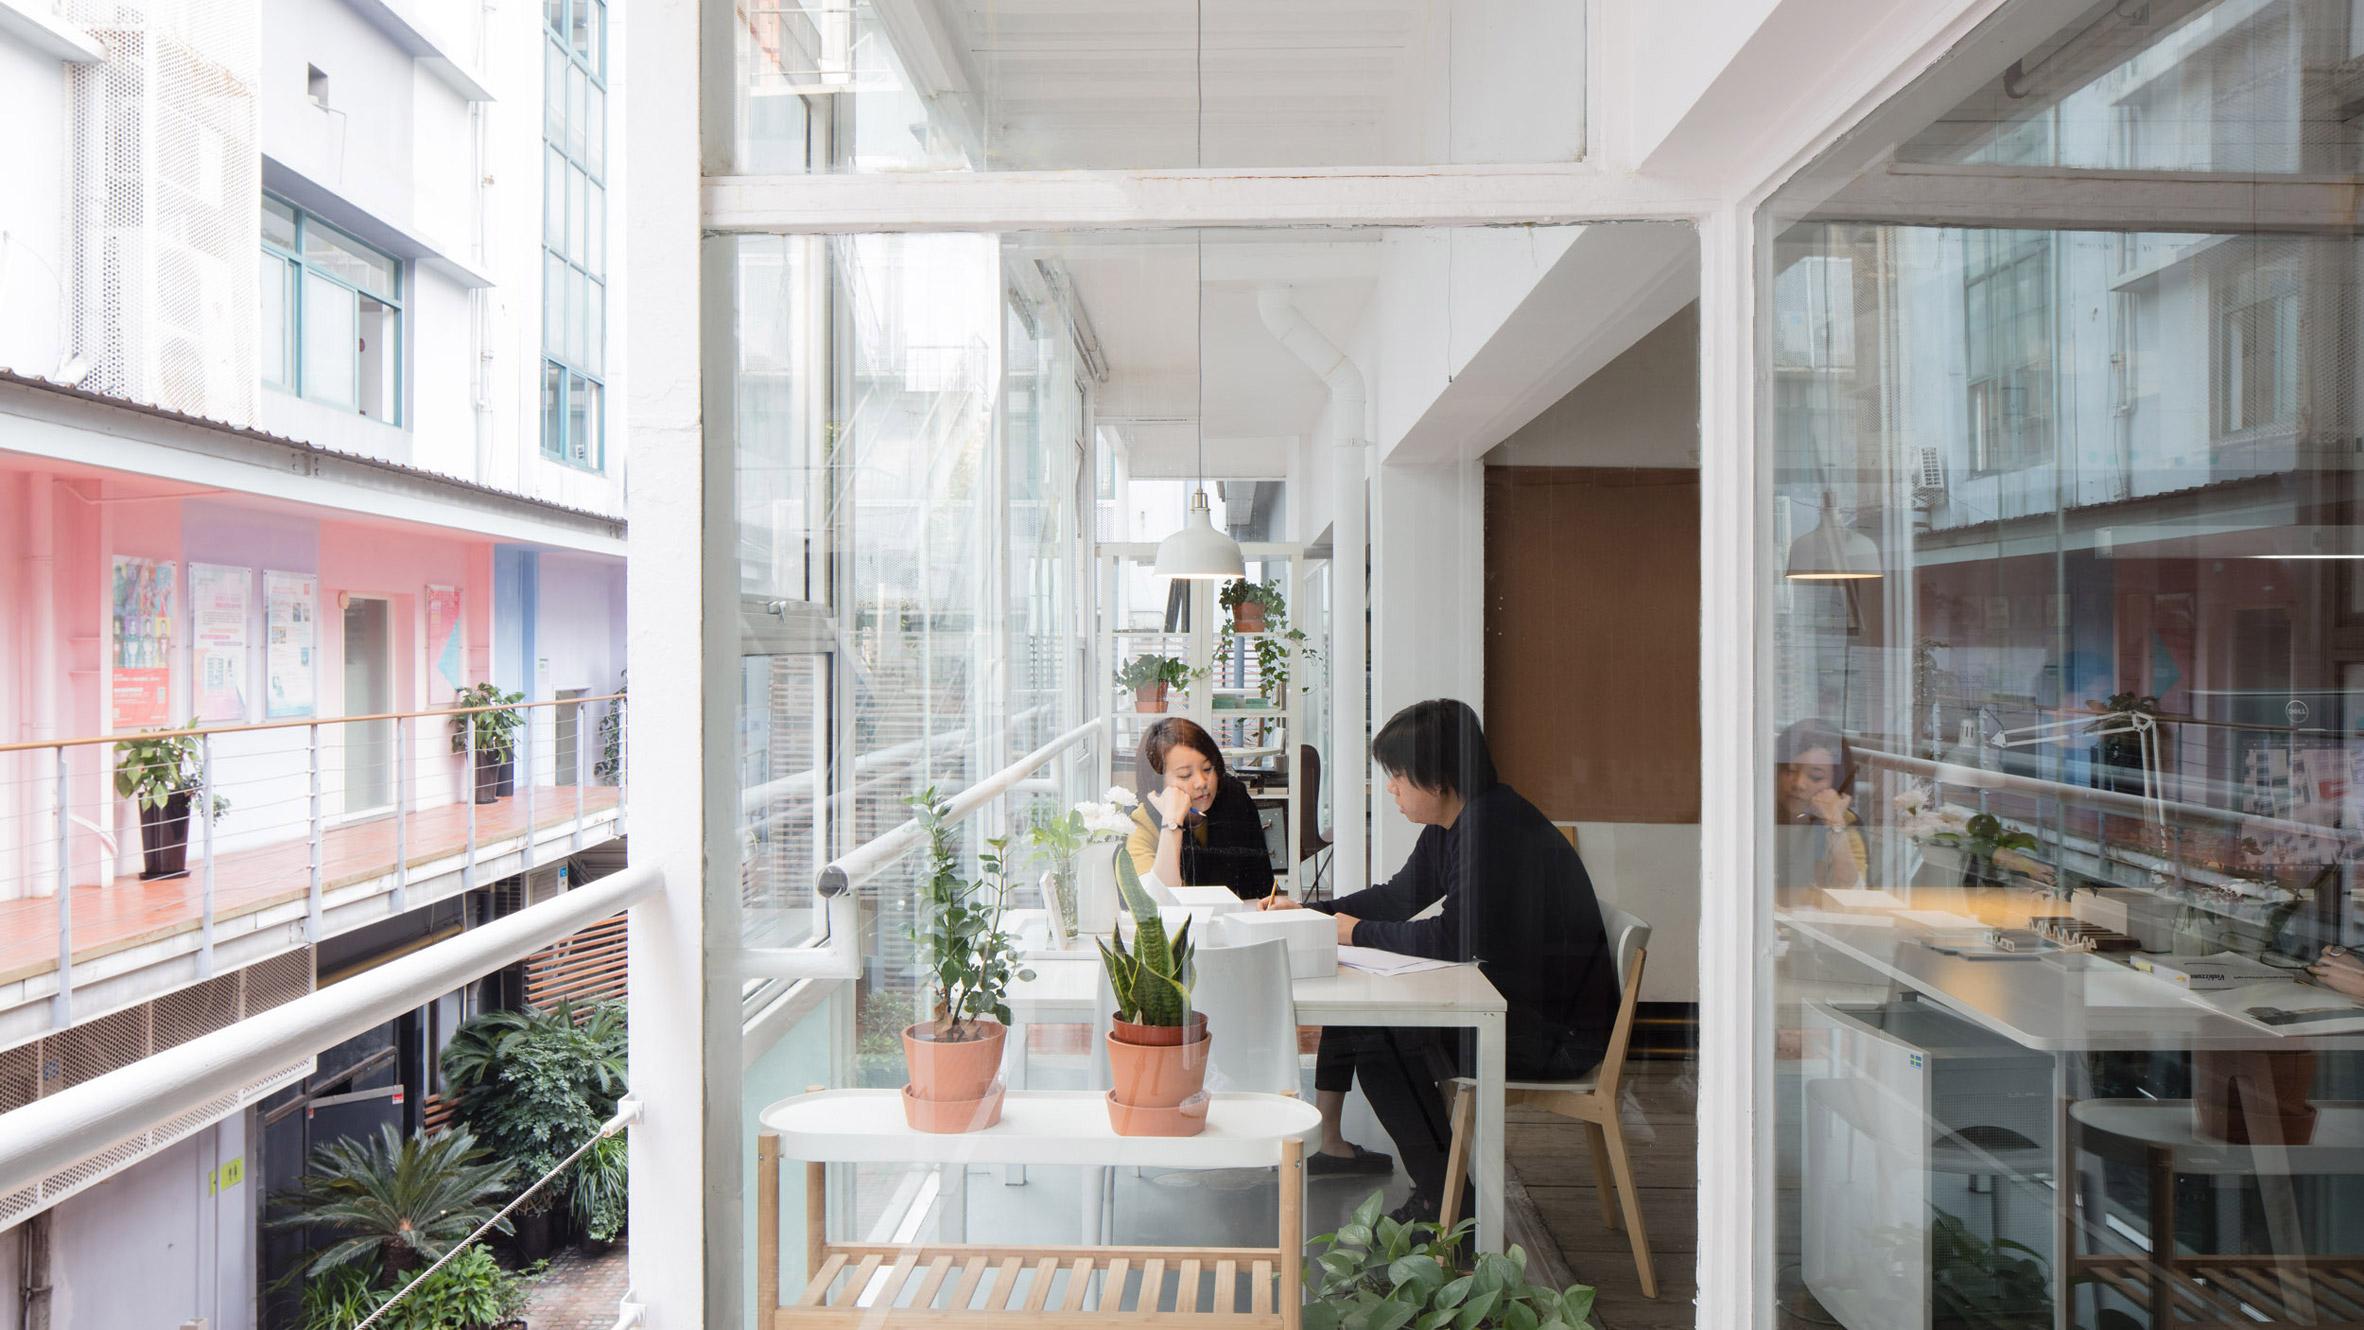 Marc Goodwin photographs Shanghai studios